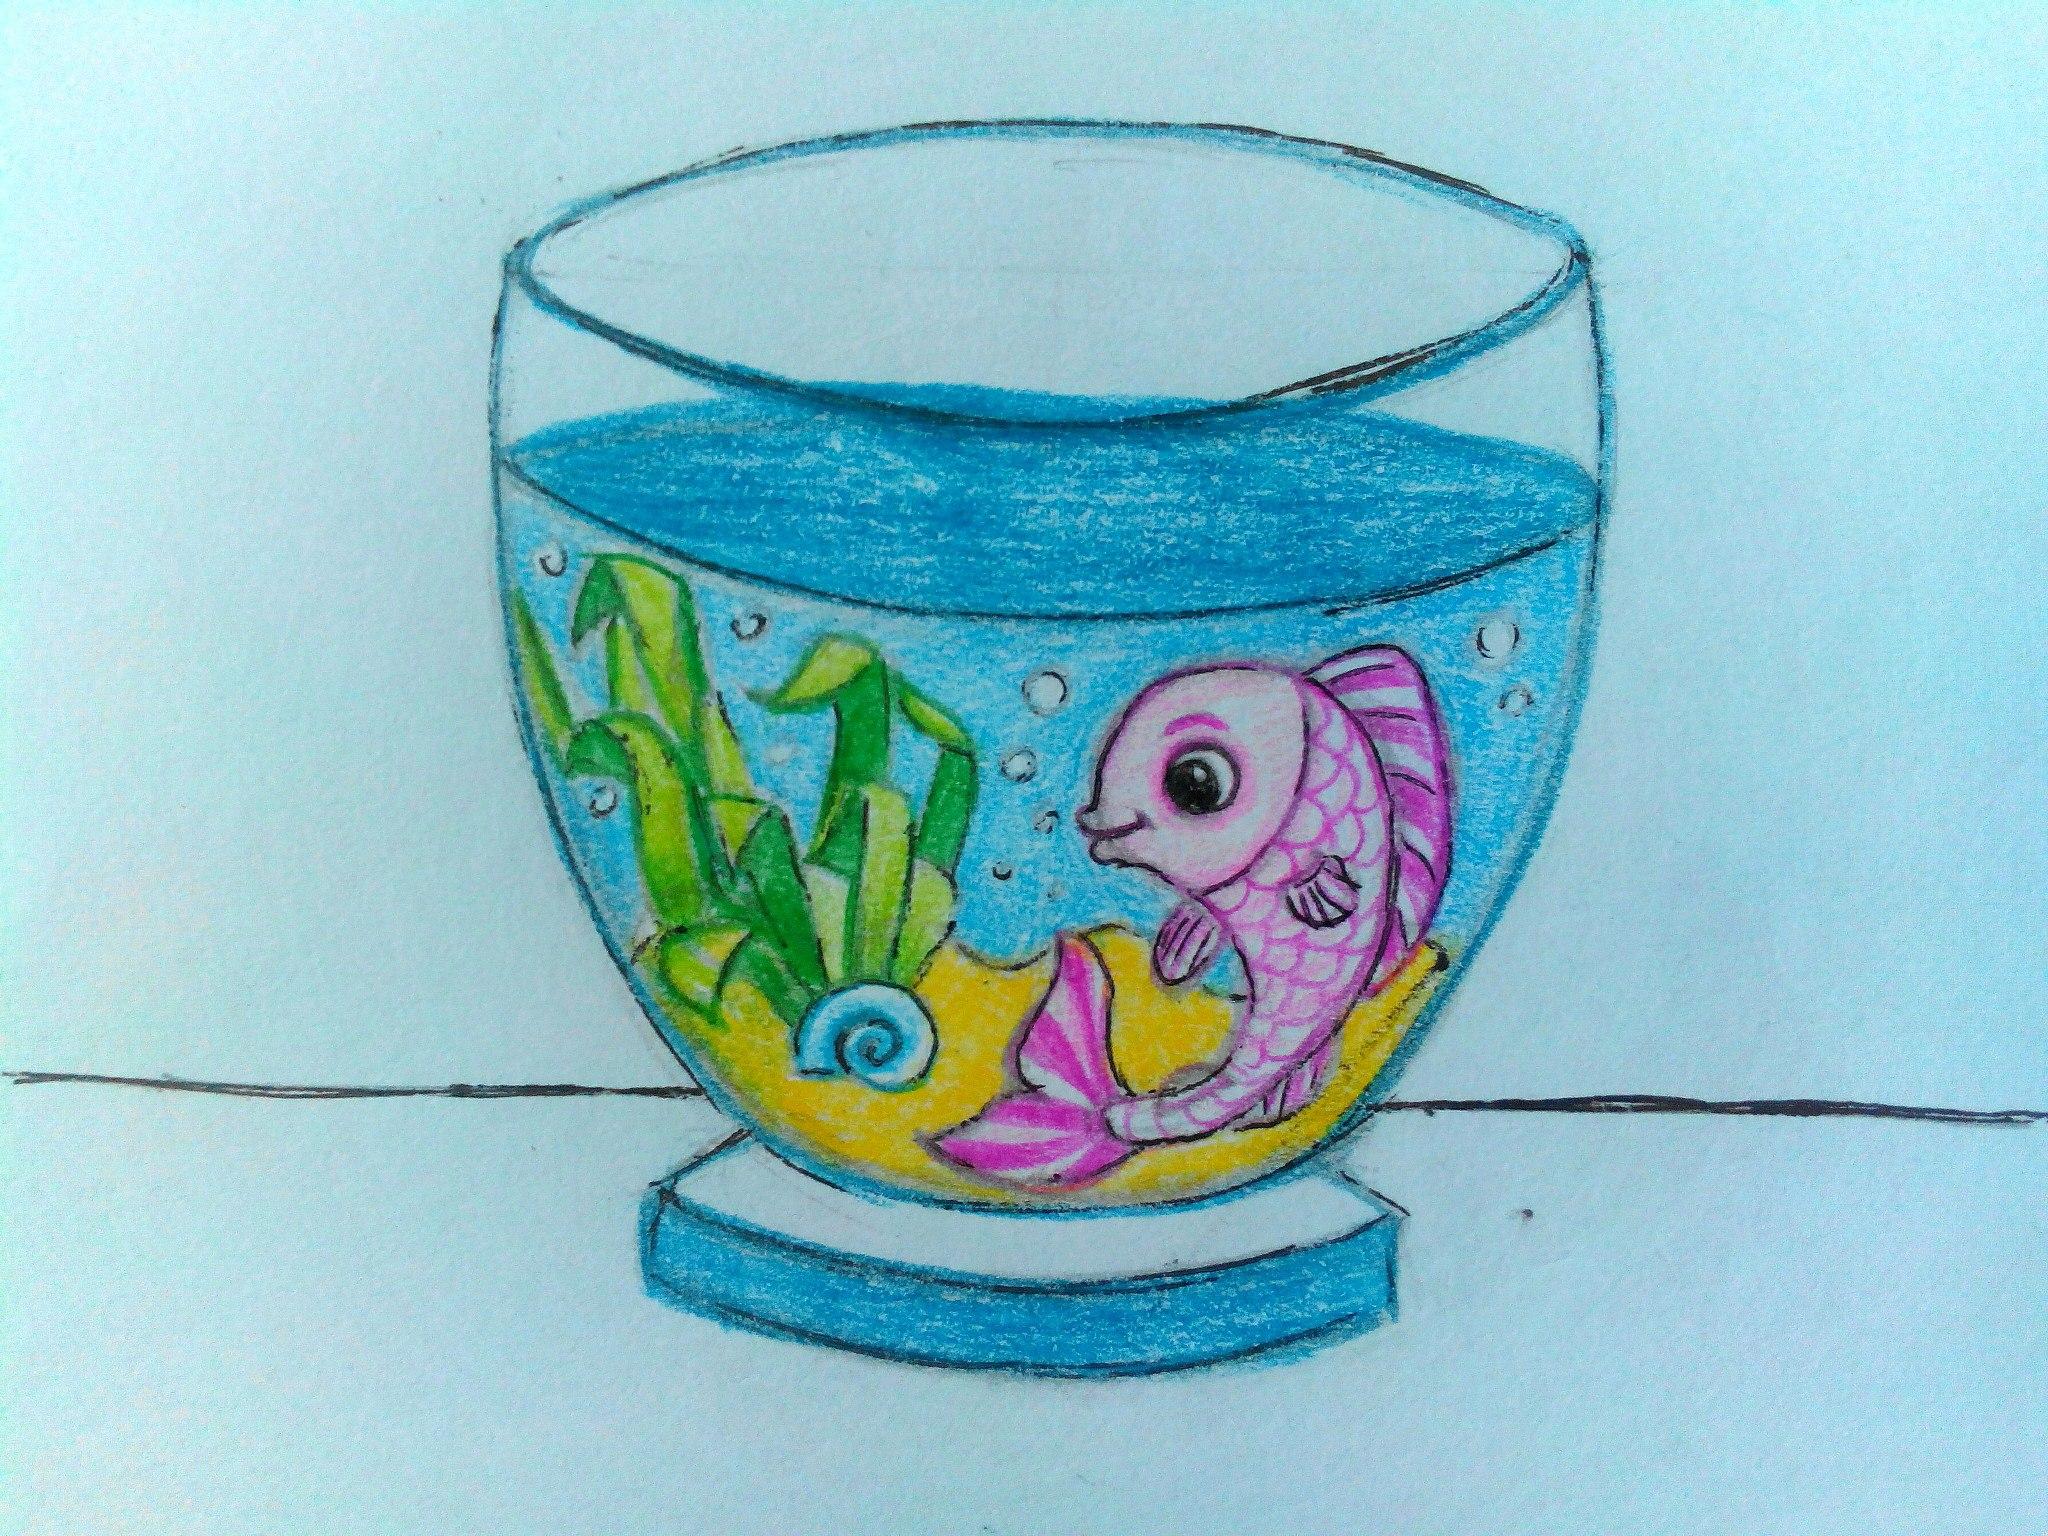 нарисованный аквариум